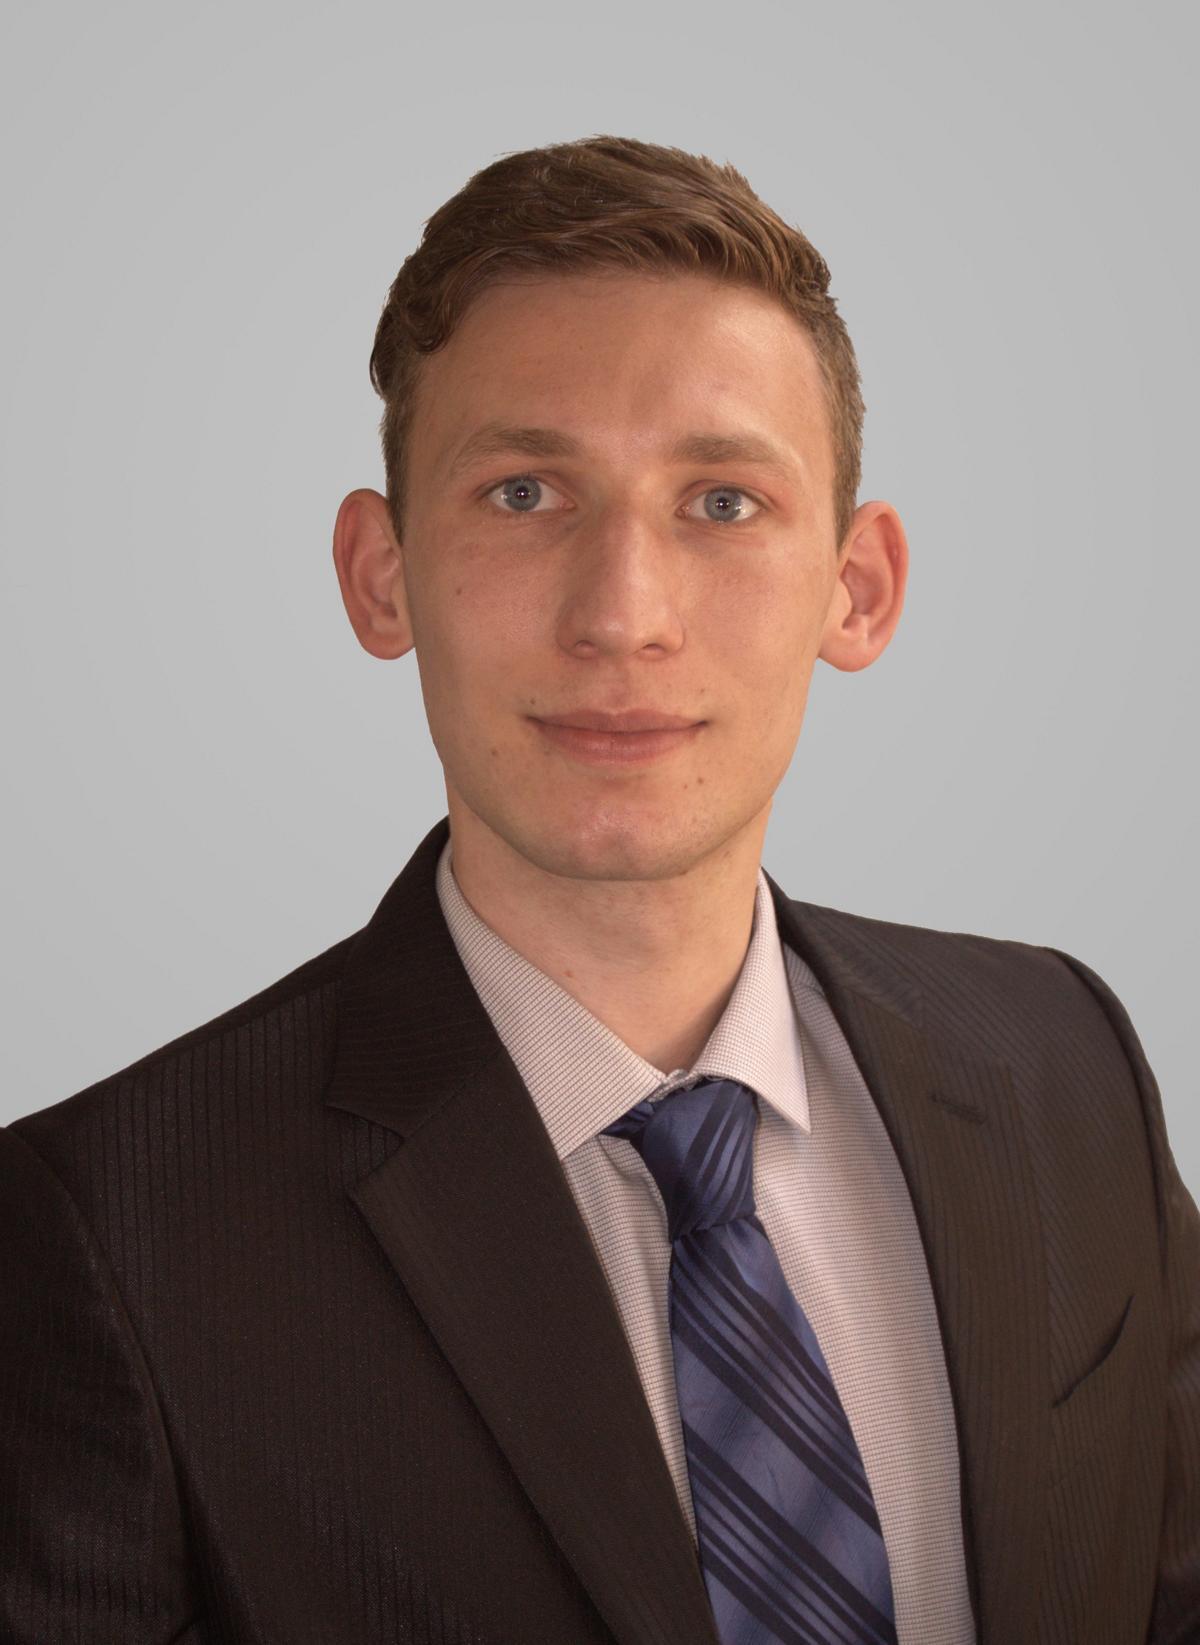 Markus Jakob